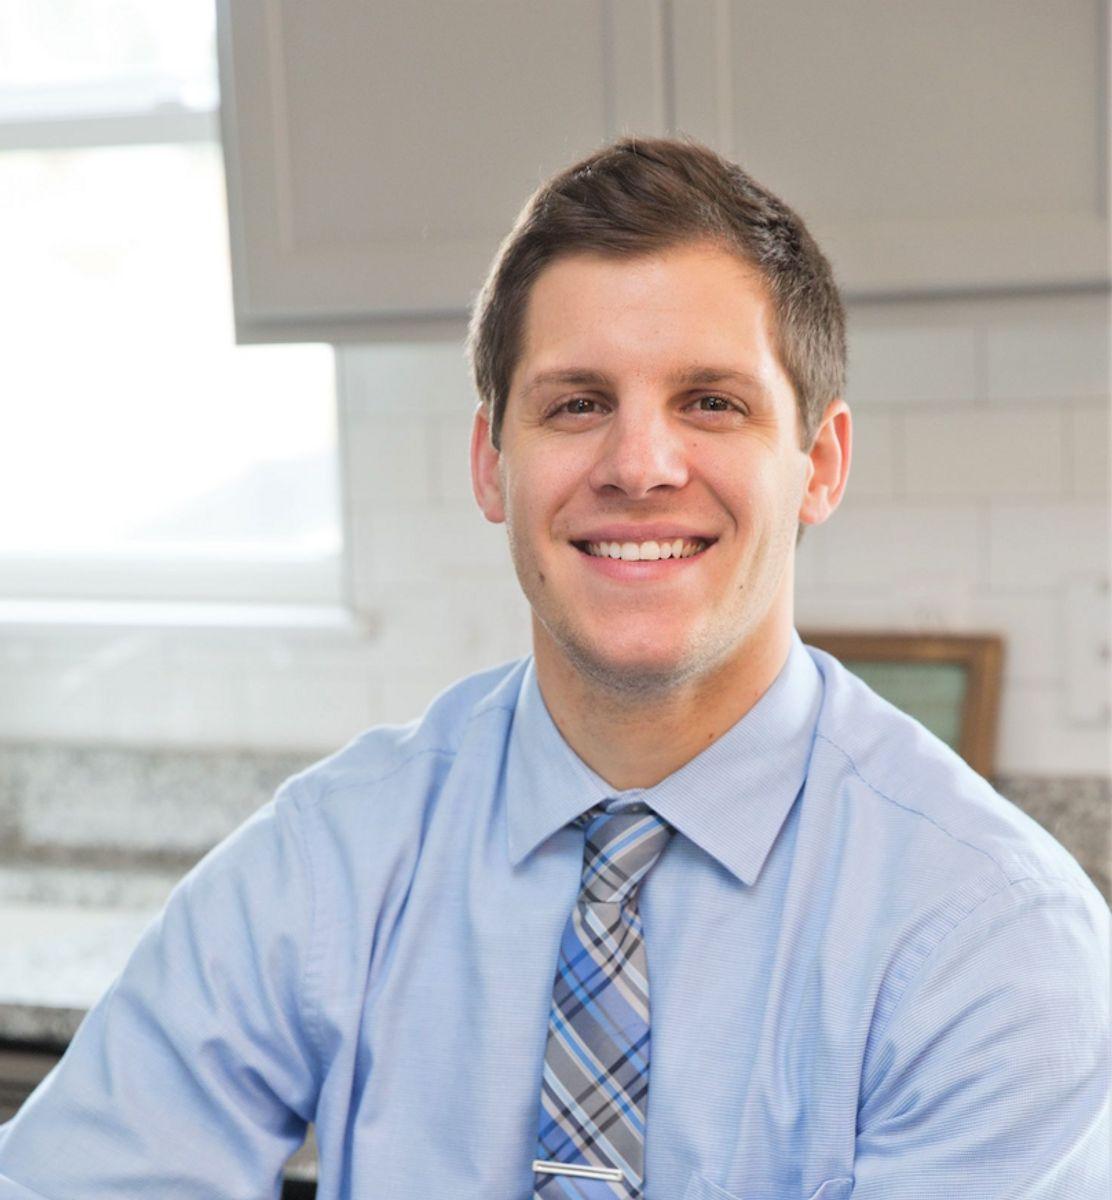 Steven Hoeflich